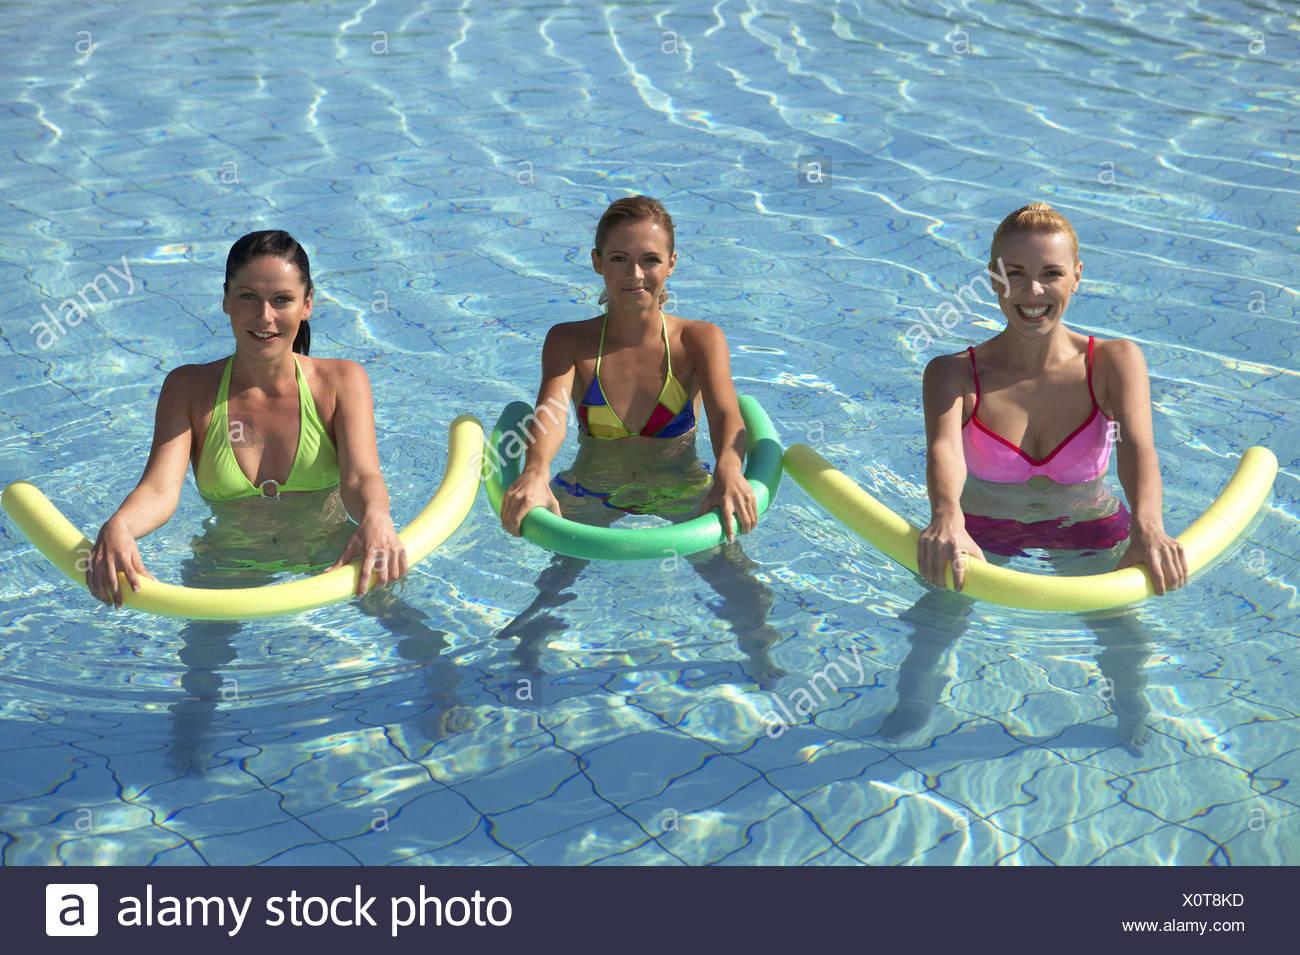 Wasserbecken Frau Frauen 3 Jung Aquaaerobic Aquagymnastik Wassergymnastik Sport Freizeit Hobby Aktivitaet Fitness Bewegung Gymna - Stock Image